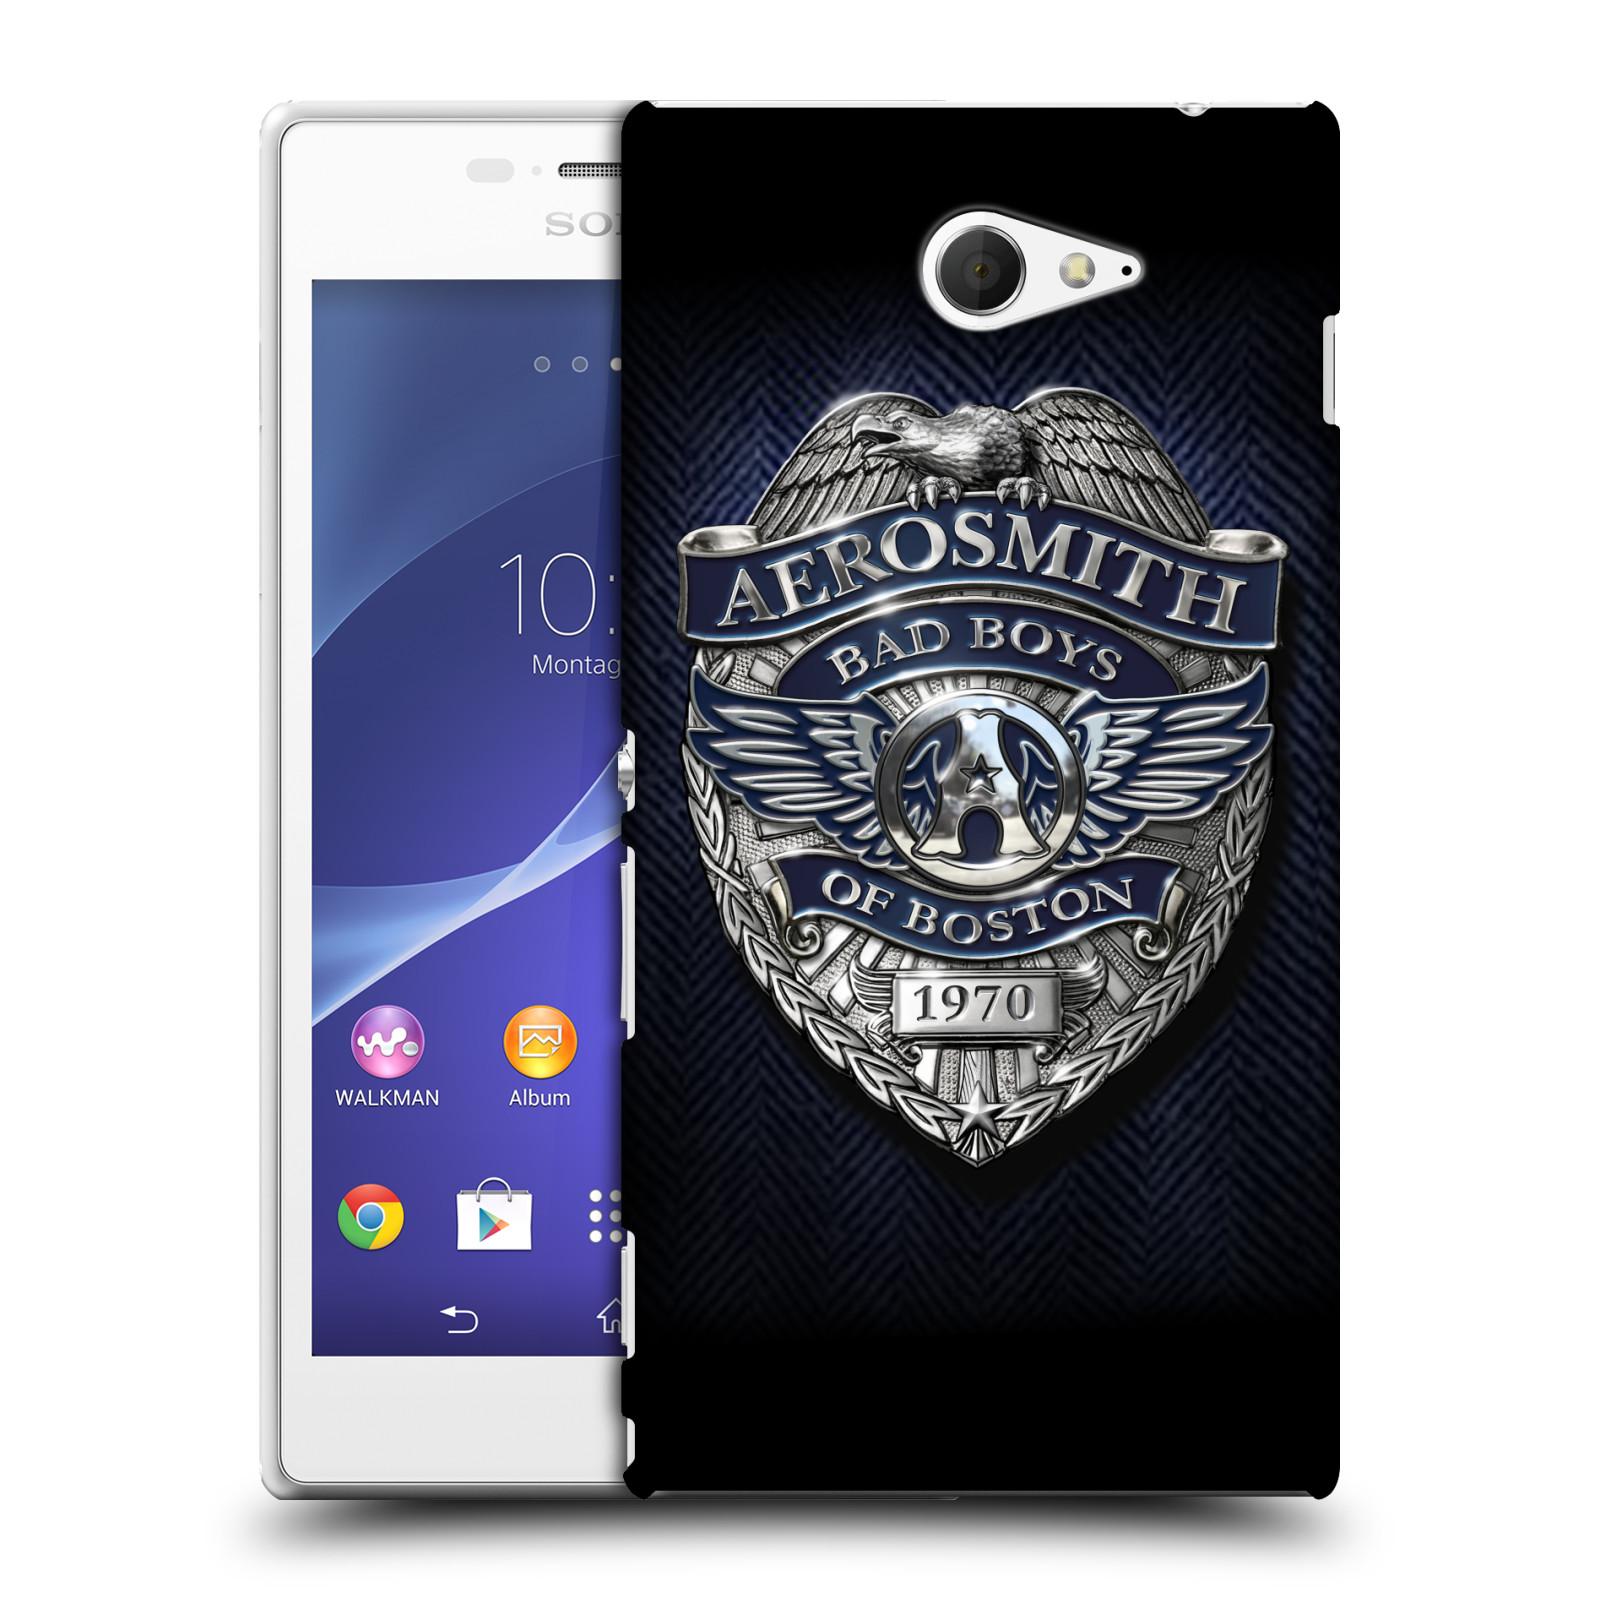 Plastové pouzdro na mobil Sony Xperia M2 D2303 HEAD CASE - Aerosmith - Bad Boys of Boston